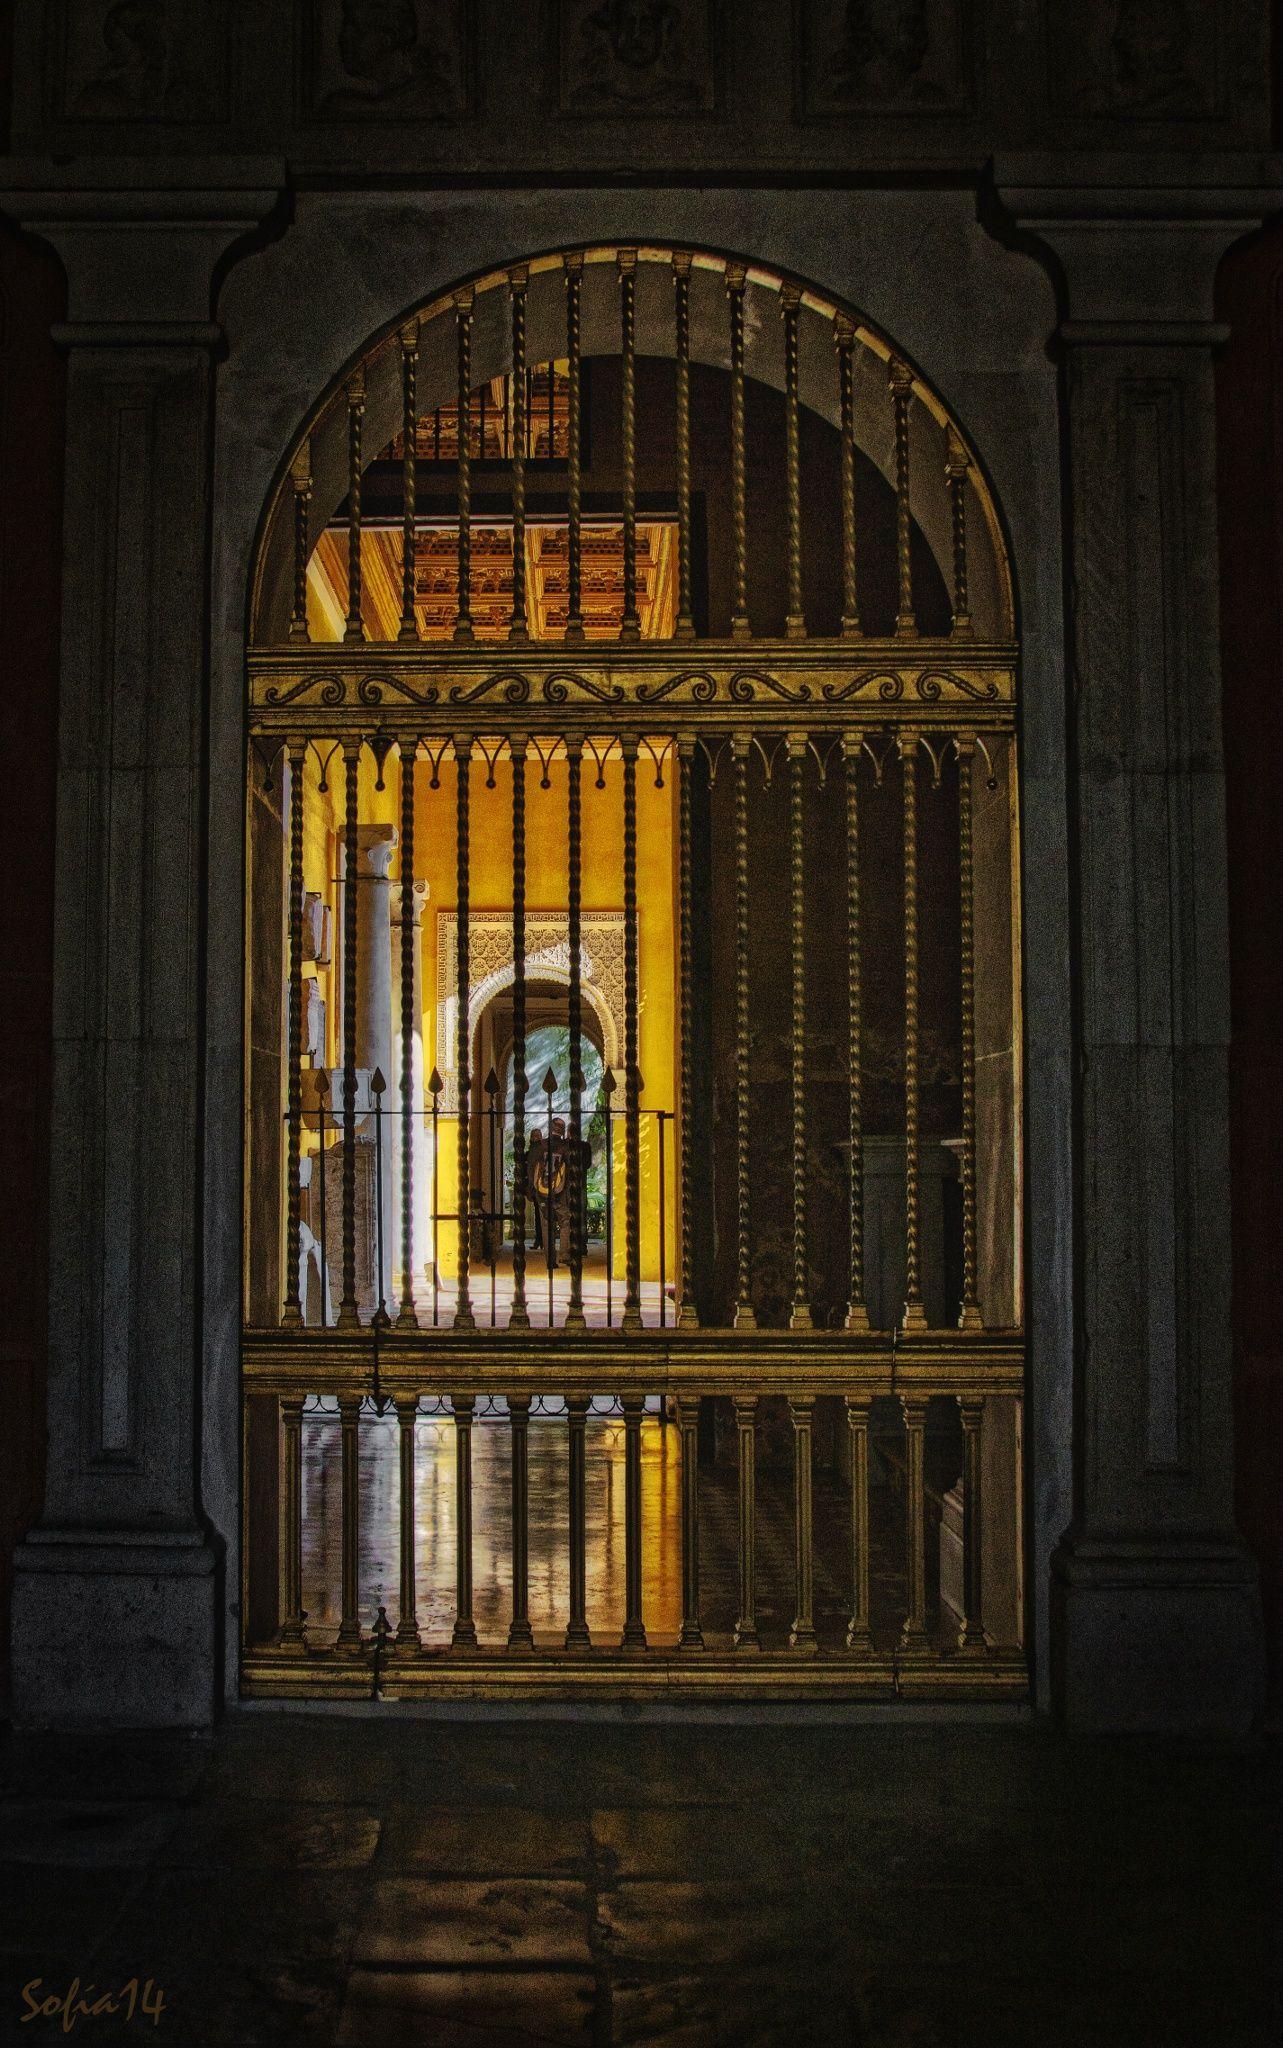 Jaulas de oro by Sofía Serra on 500px